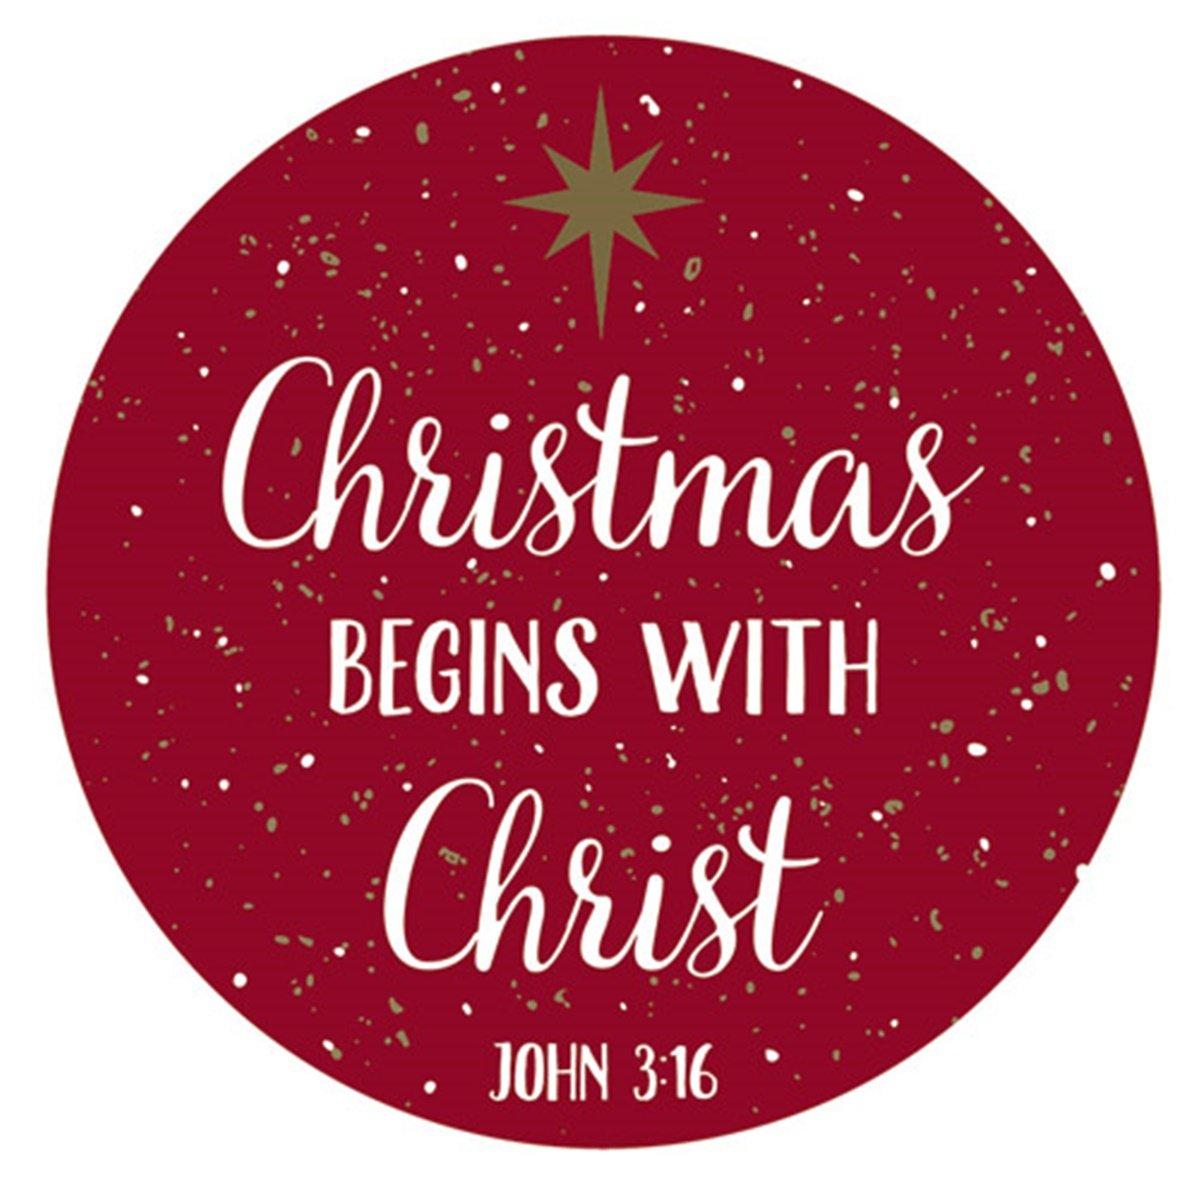 Amazon.com: Christmas Begins with Christ Magnet with John 3:16 Bible ...